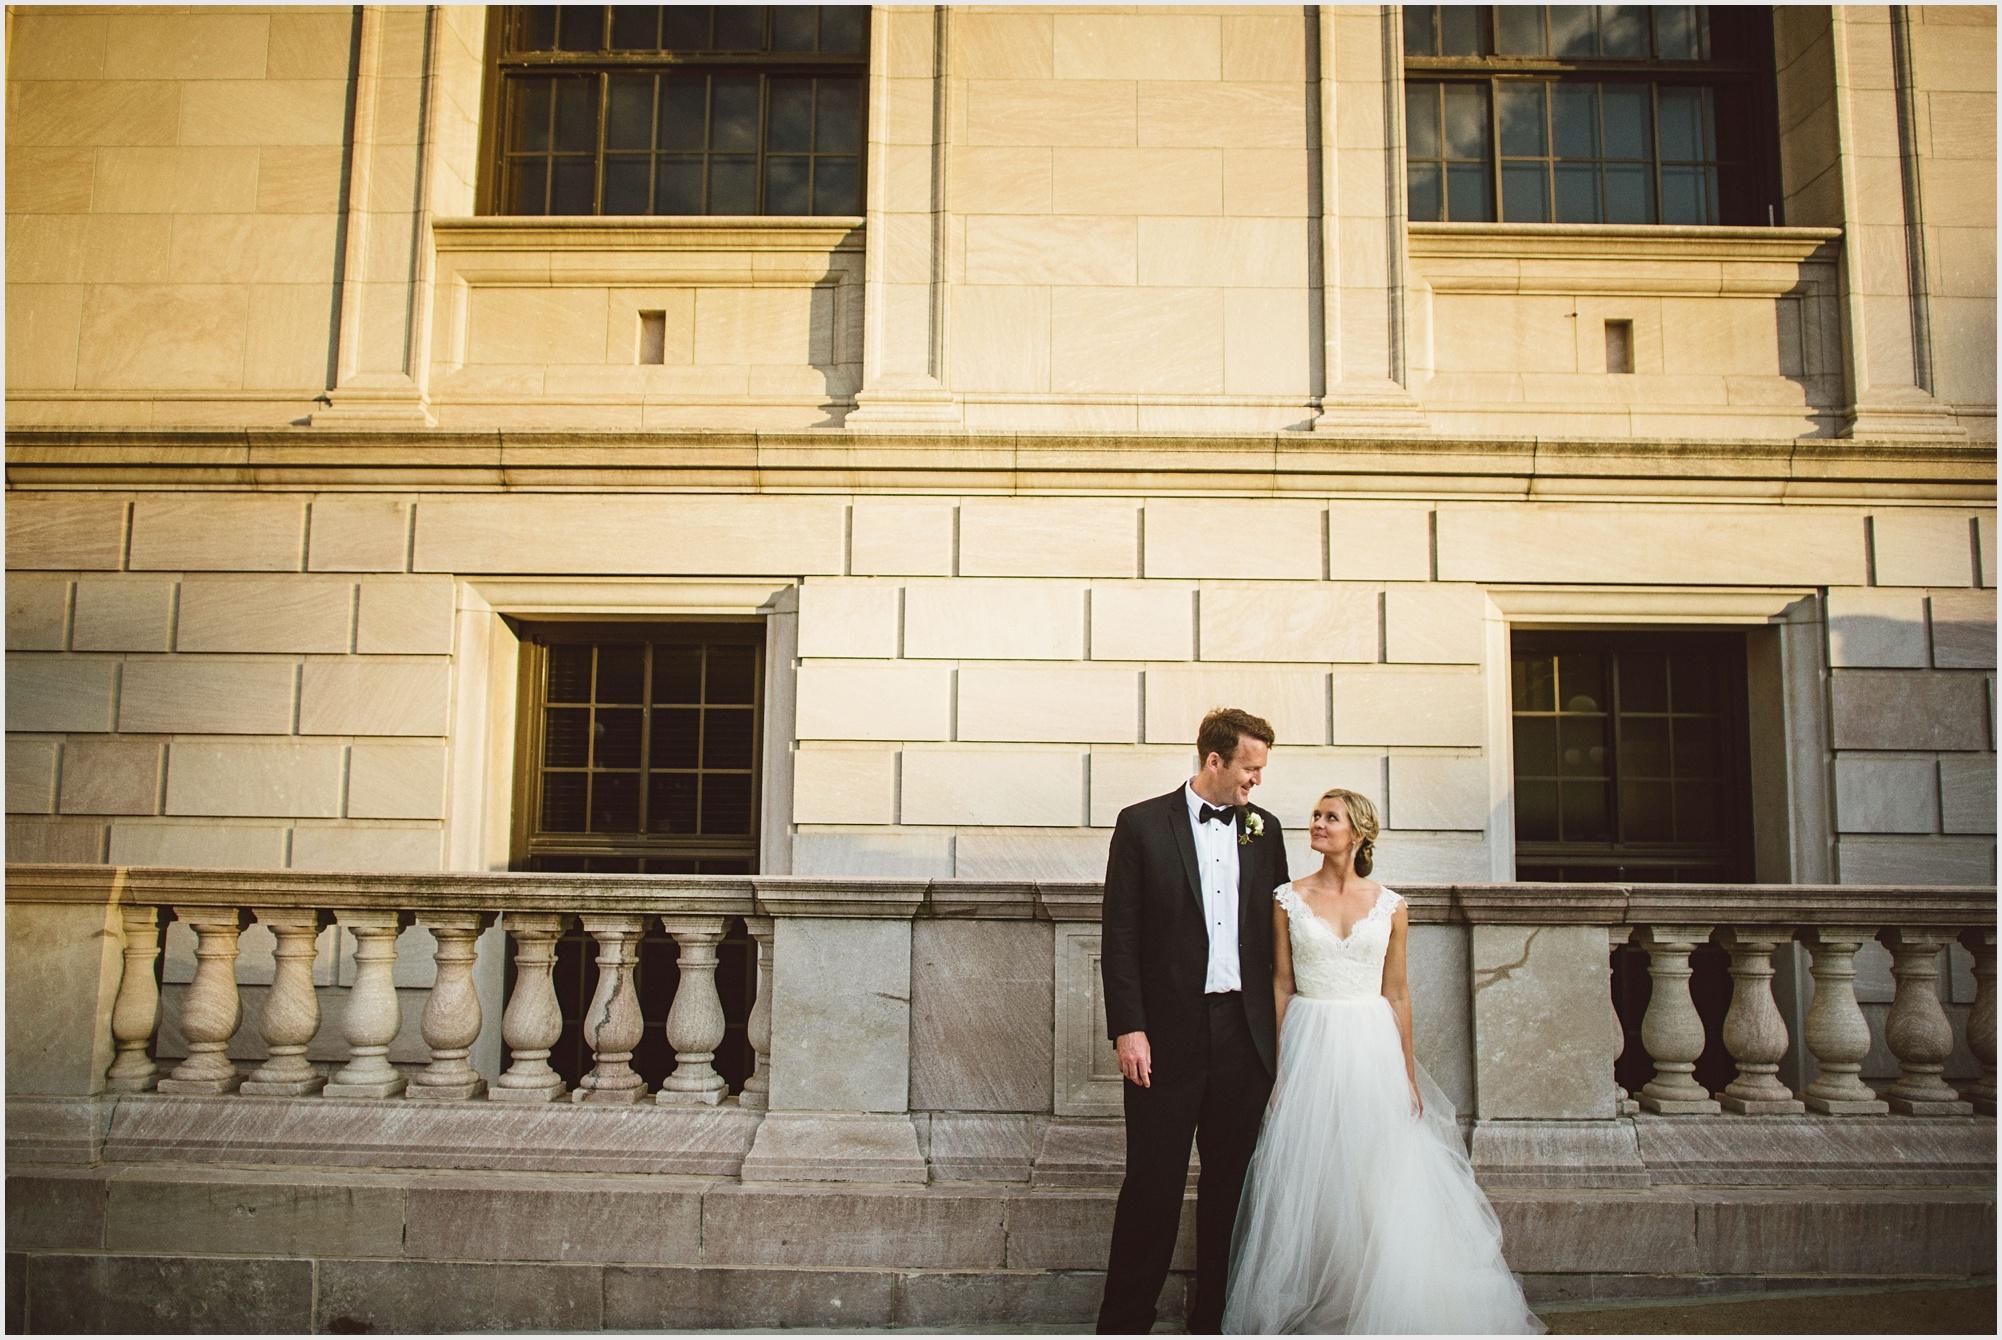 maura_david_james_j_hill_wedding_lucas_botz_photography_048.jpg